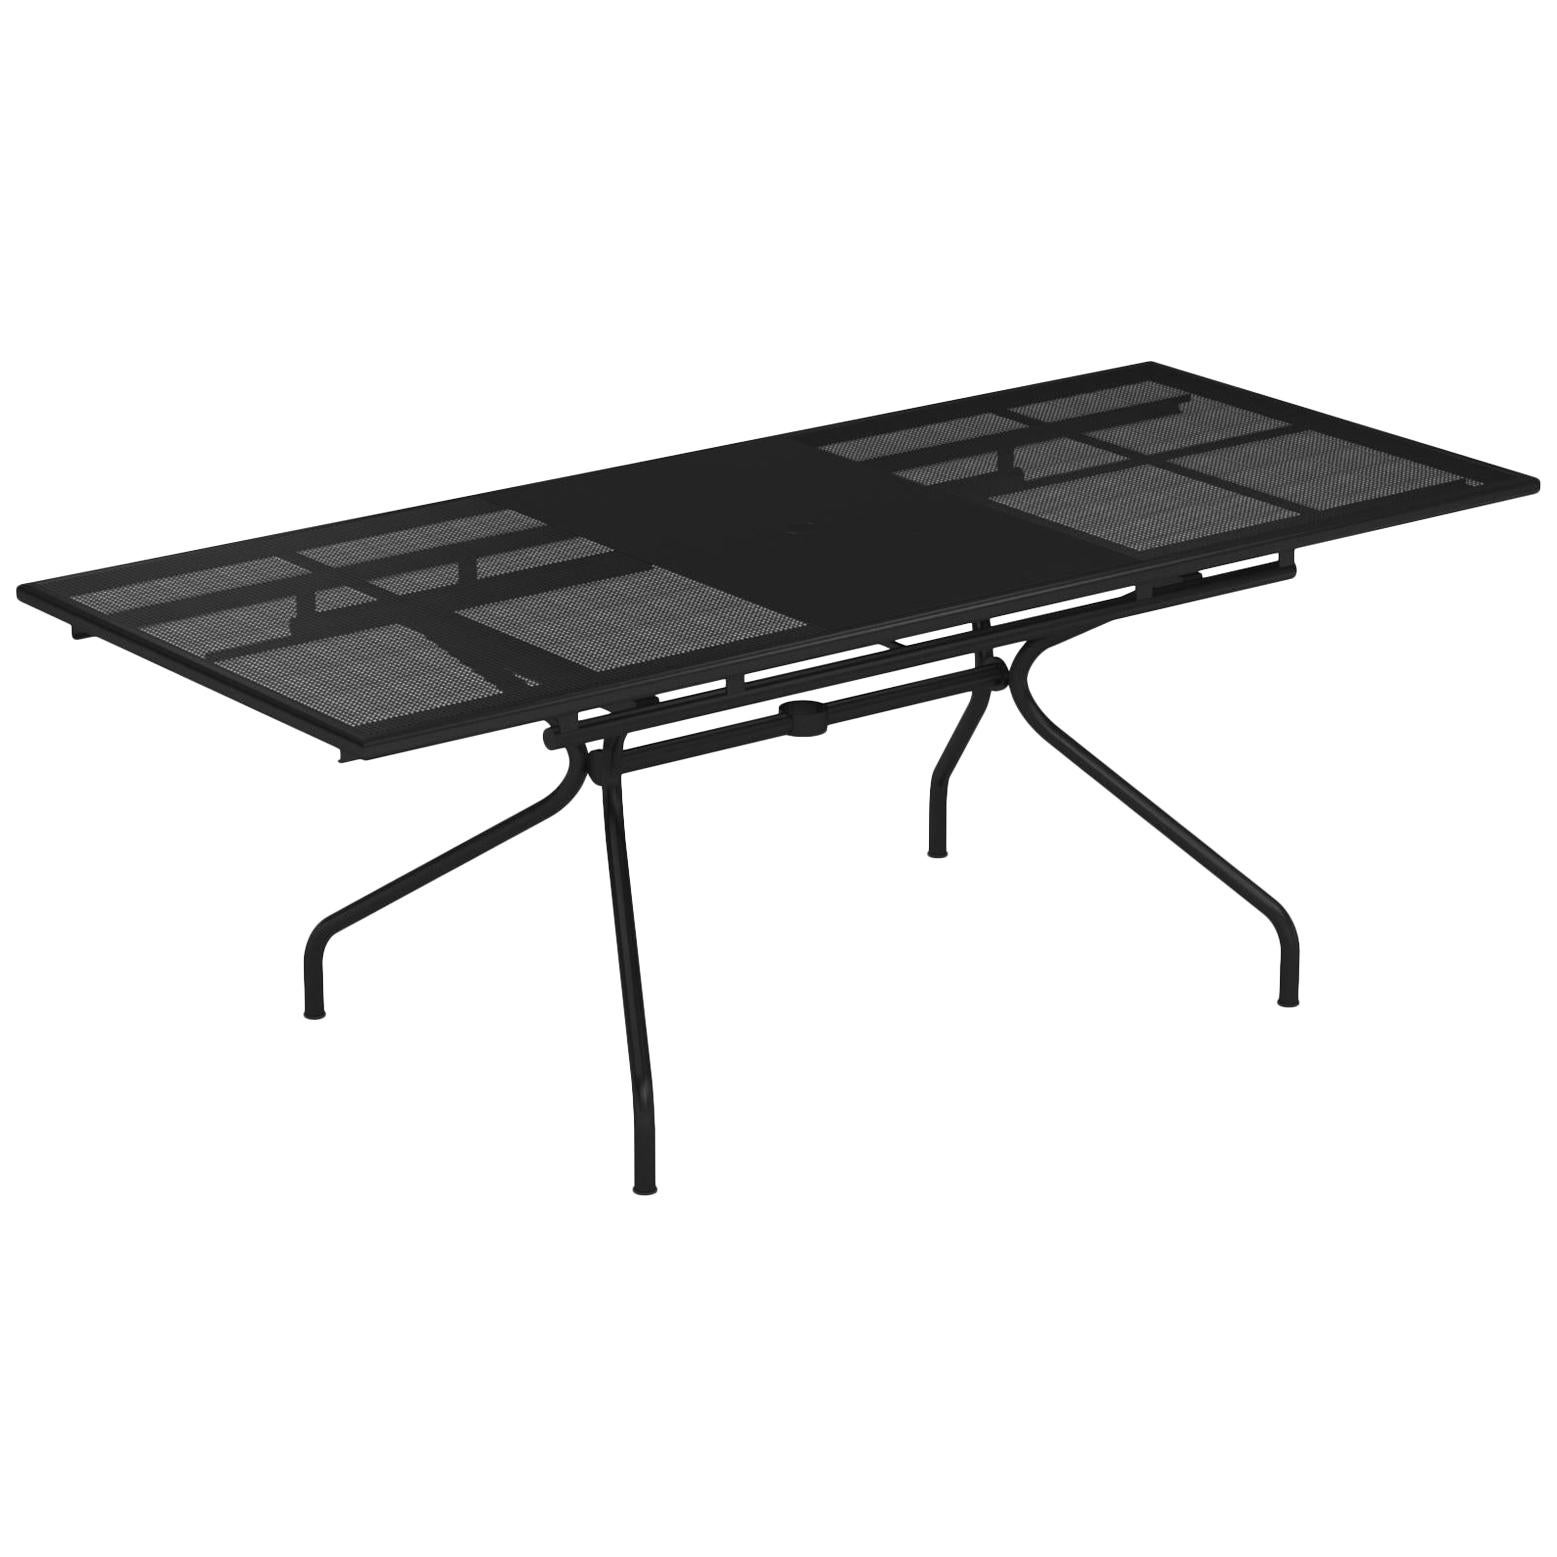 Steel EMU Athena 6+2 Seats Extensible Table